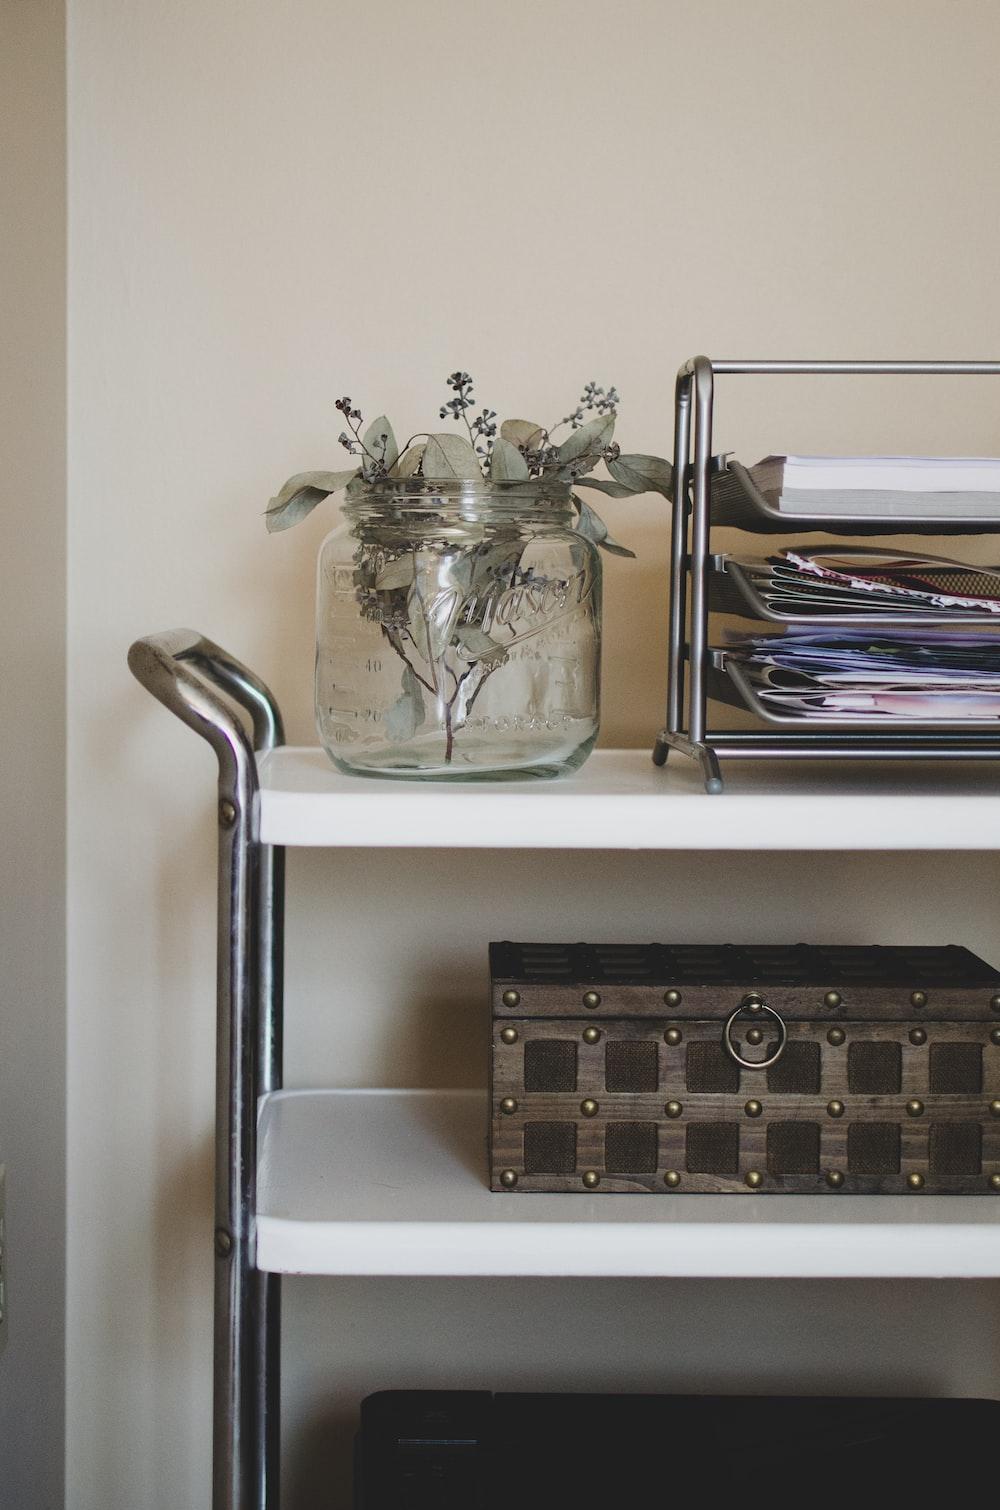 clear glass vase on white wooden shelf